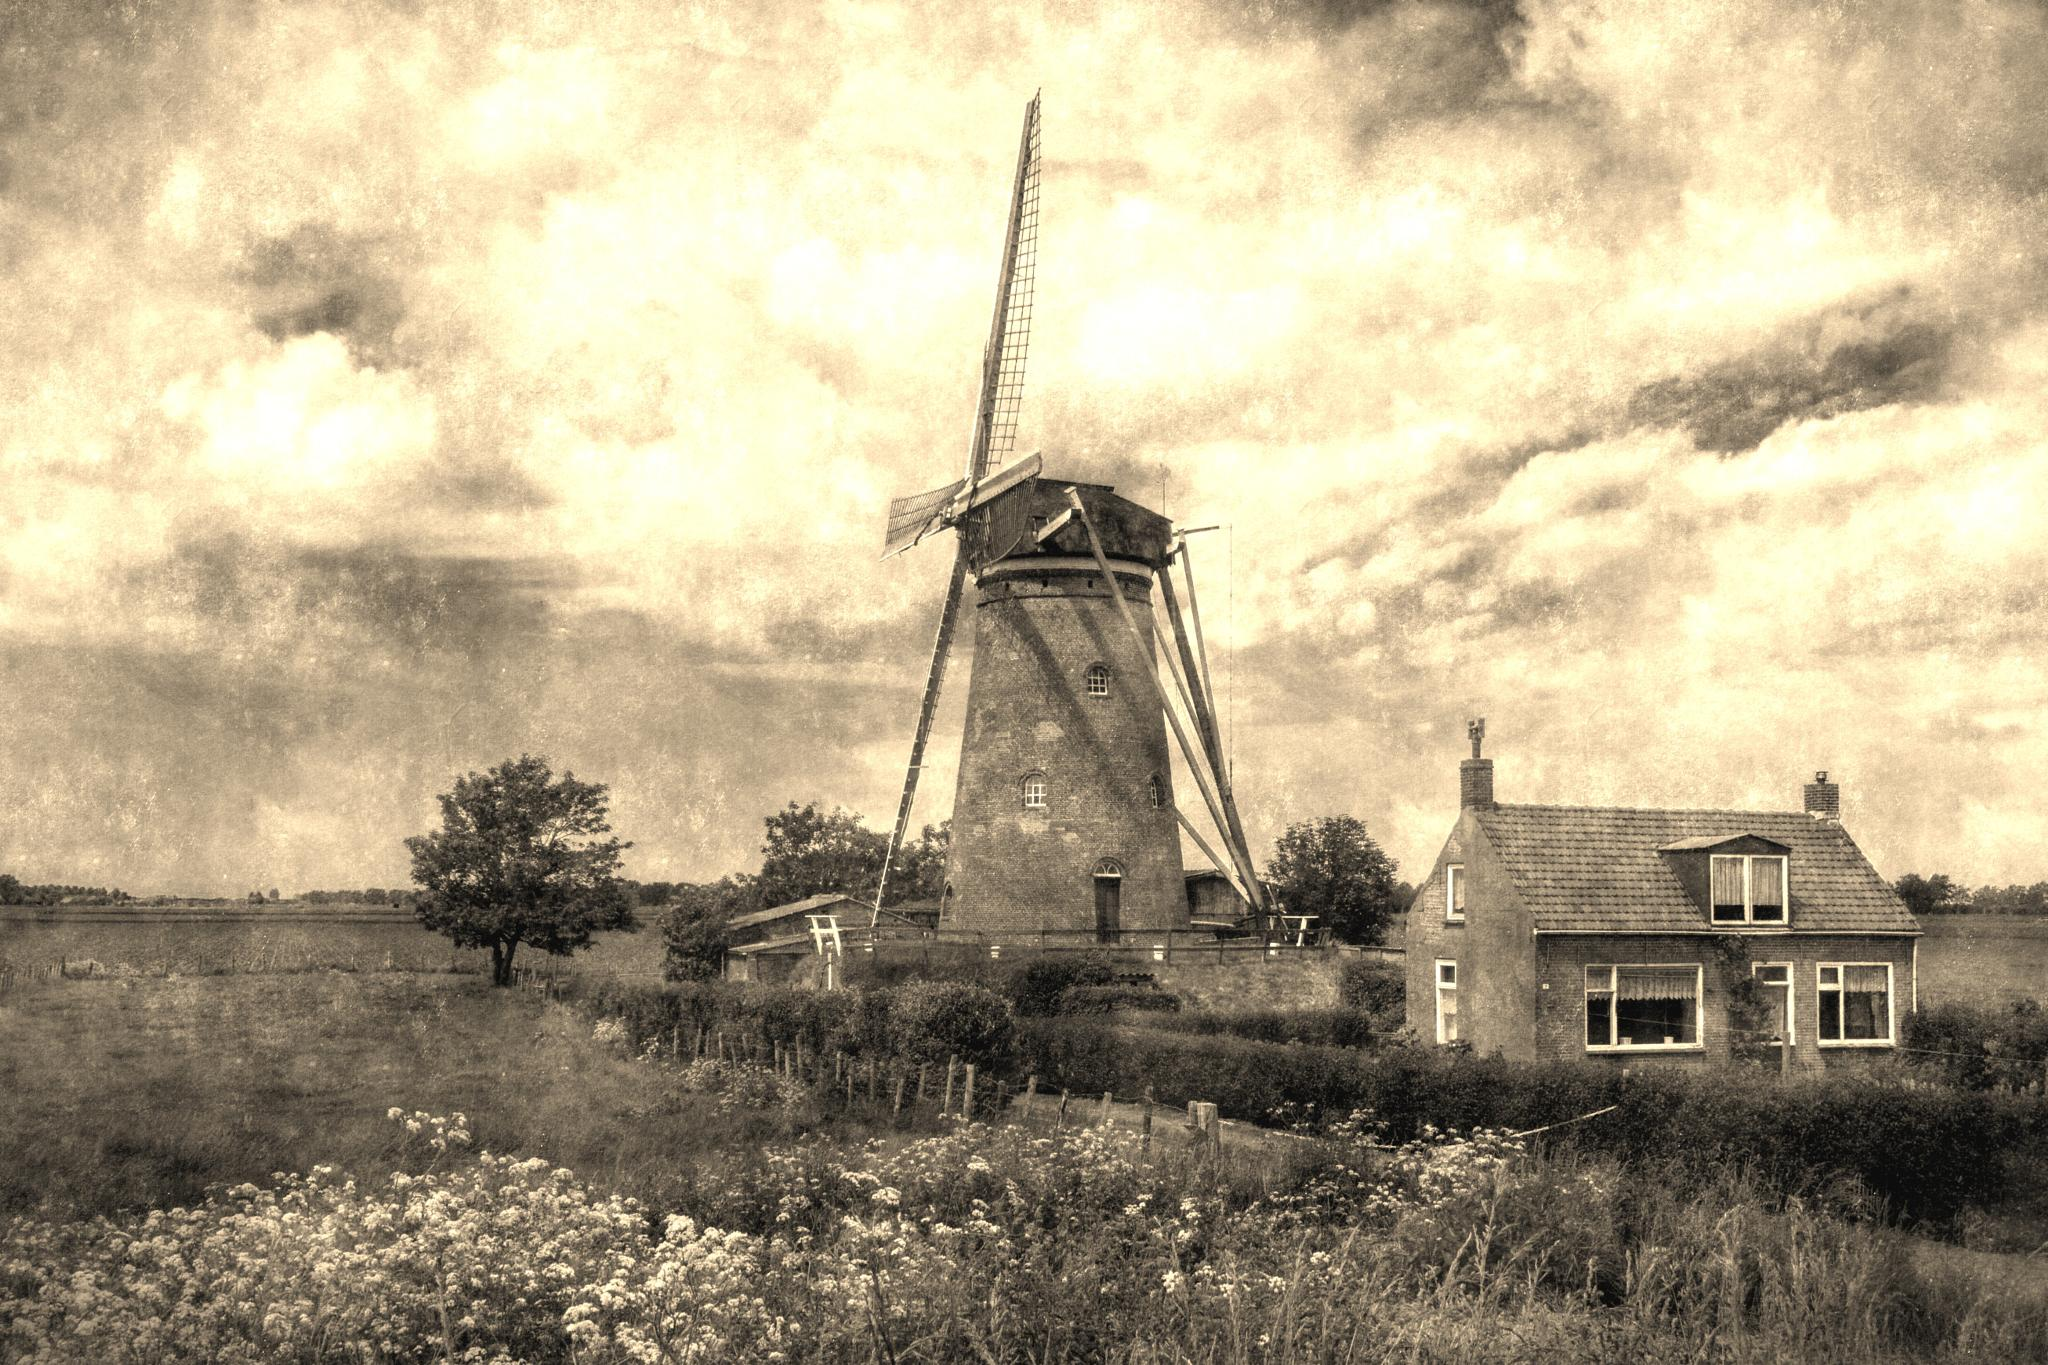 Windmill by Rob van der Griend